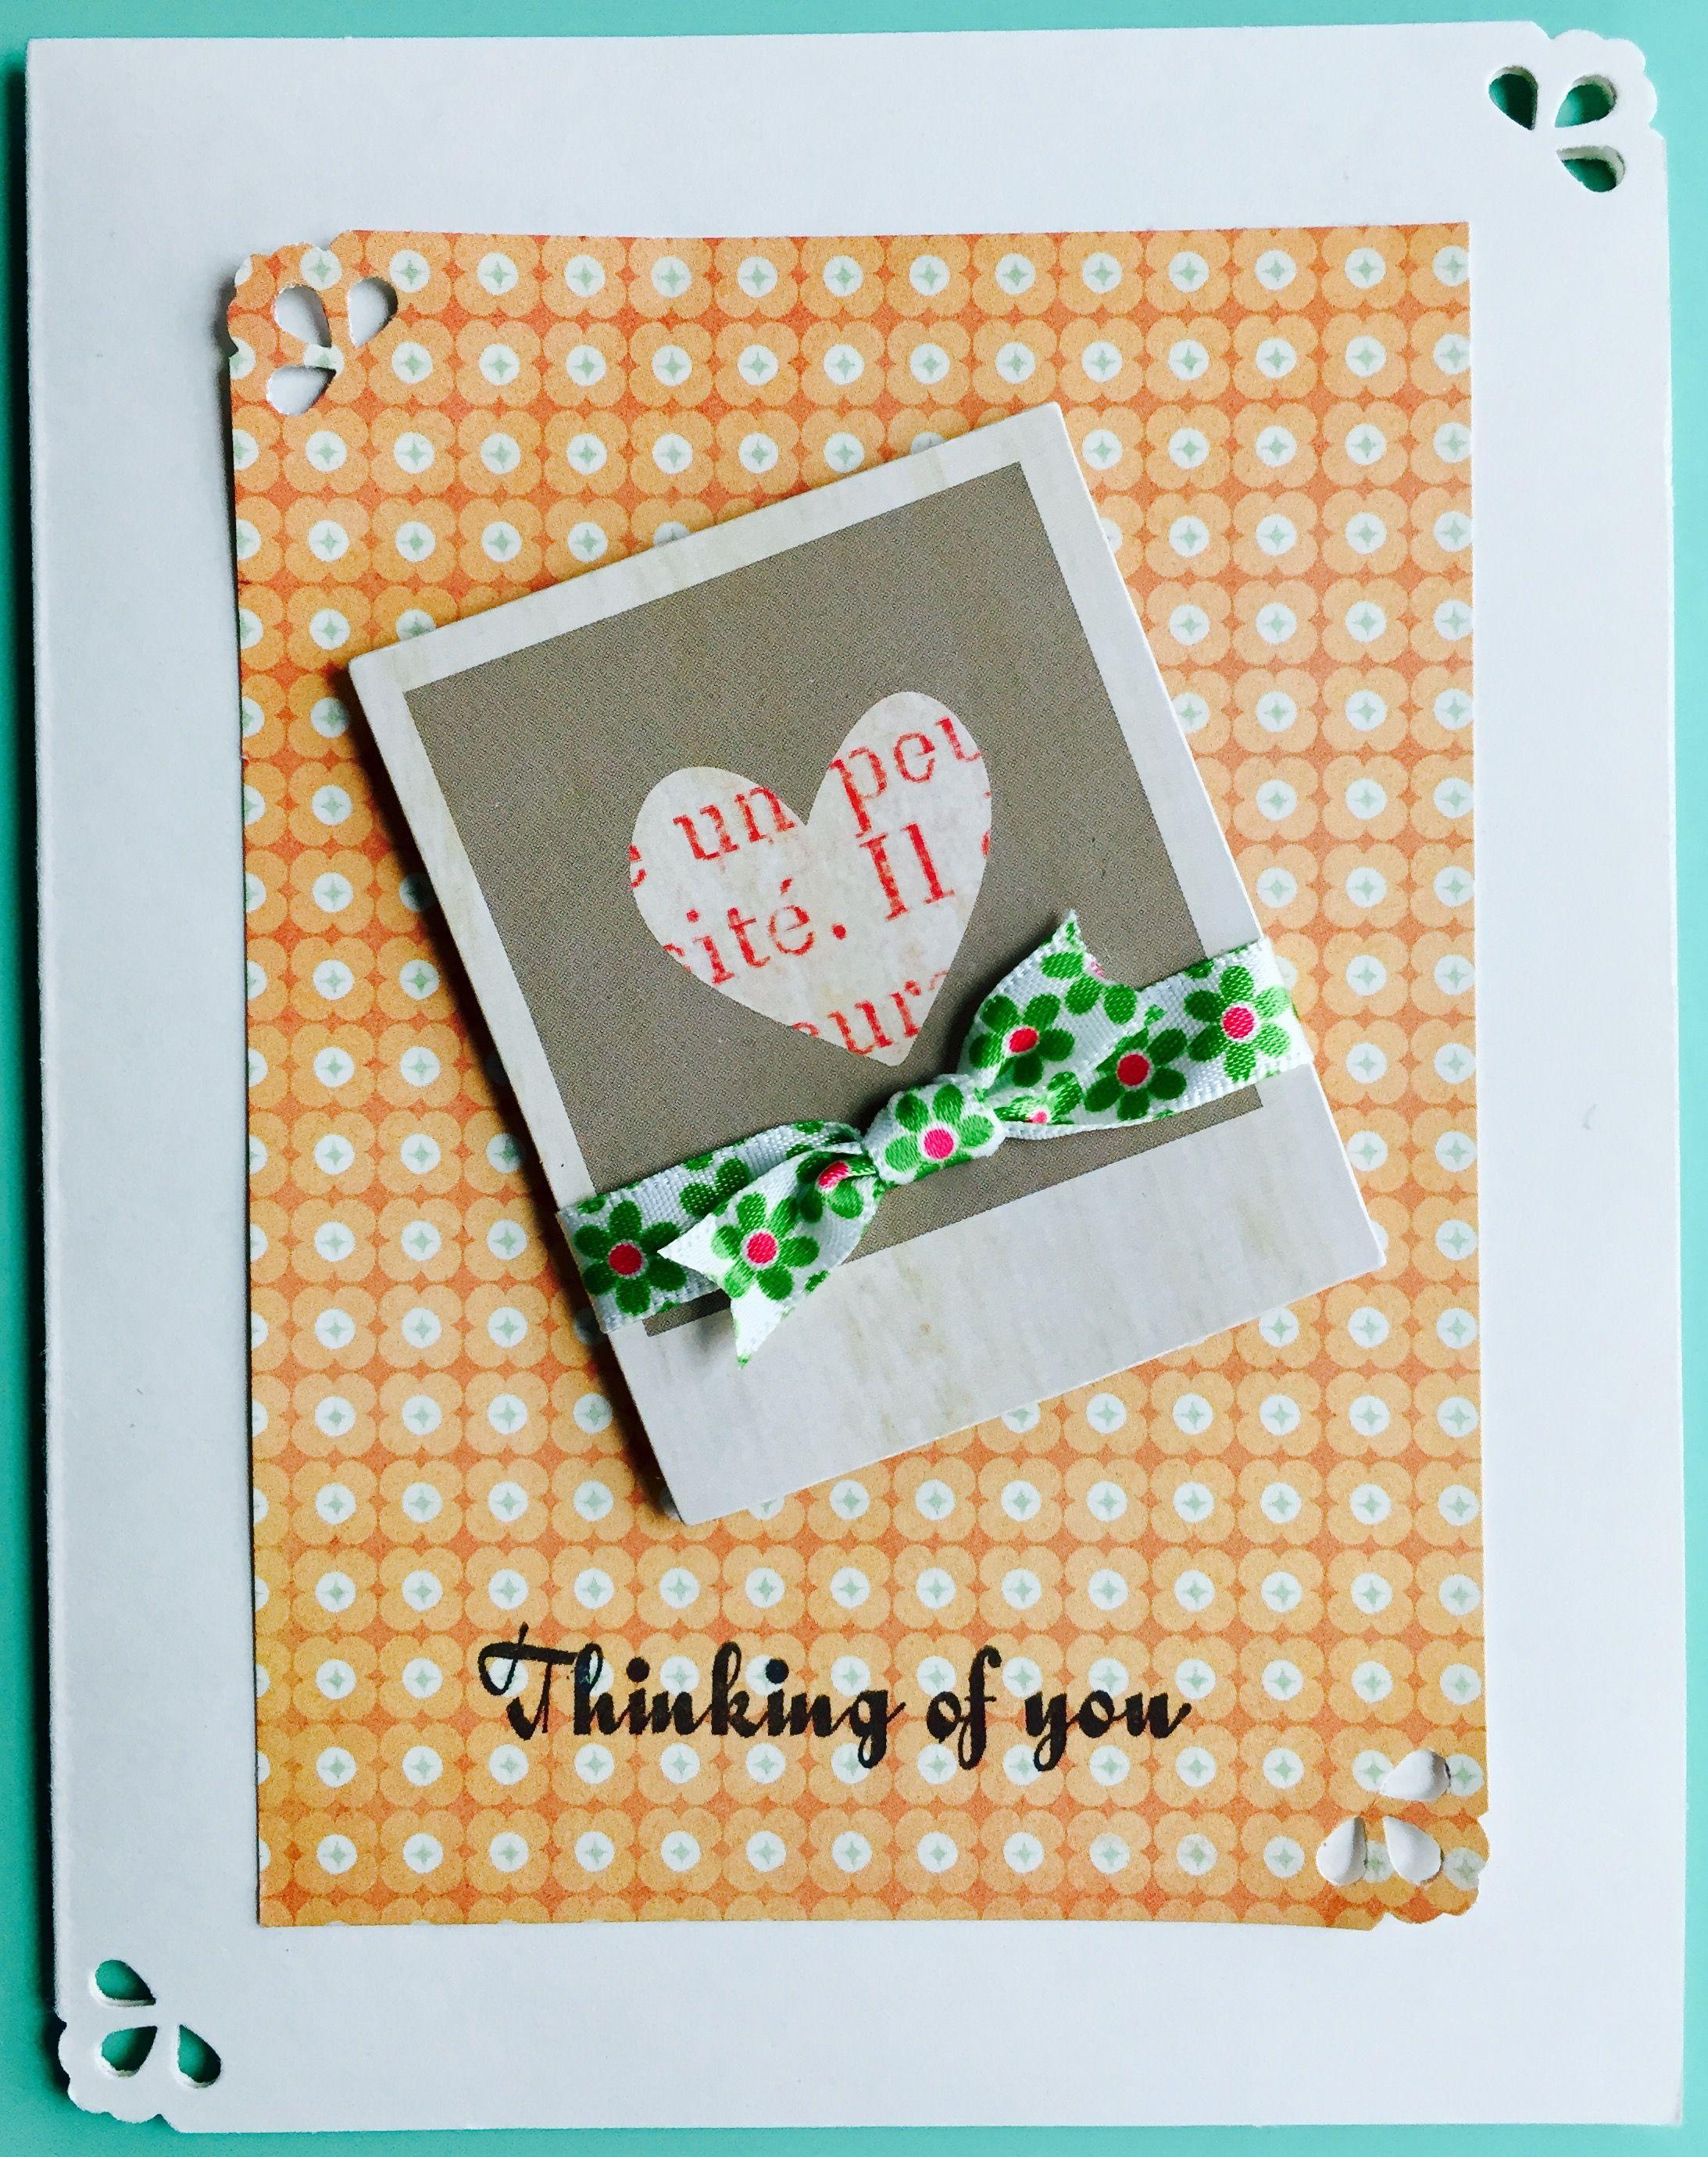 Beautiful Sympathy Thinking Of You Greeting Cards Colorful Orange